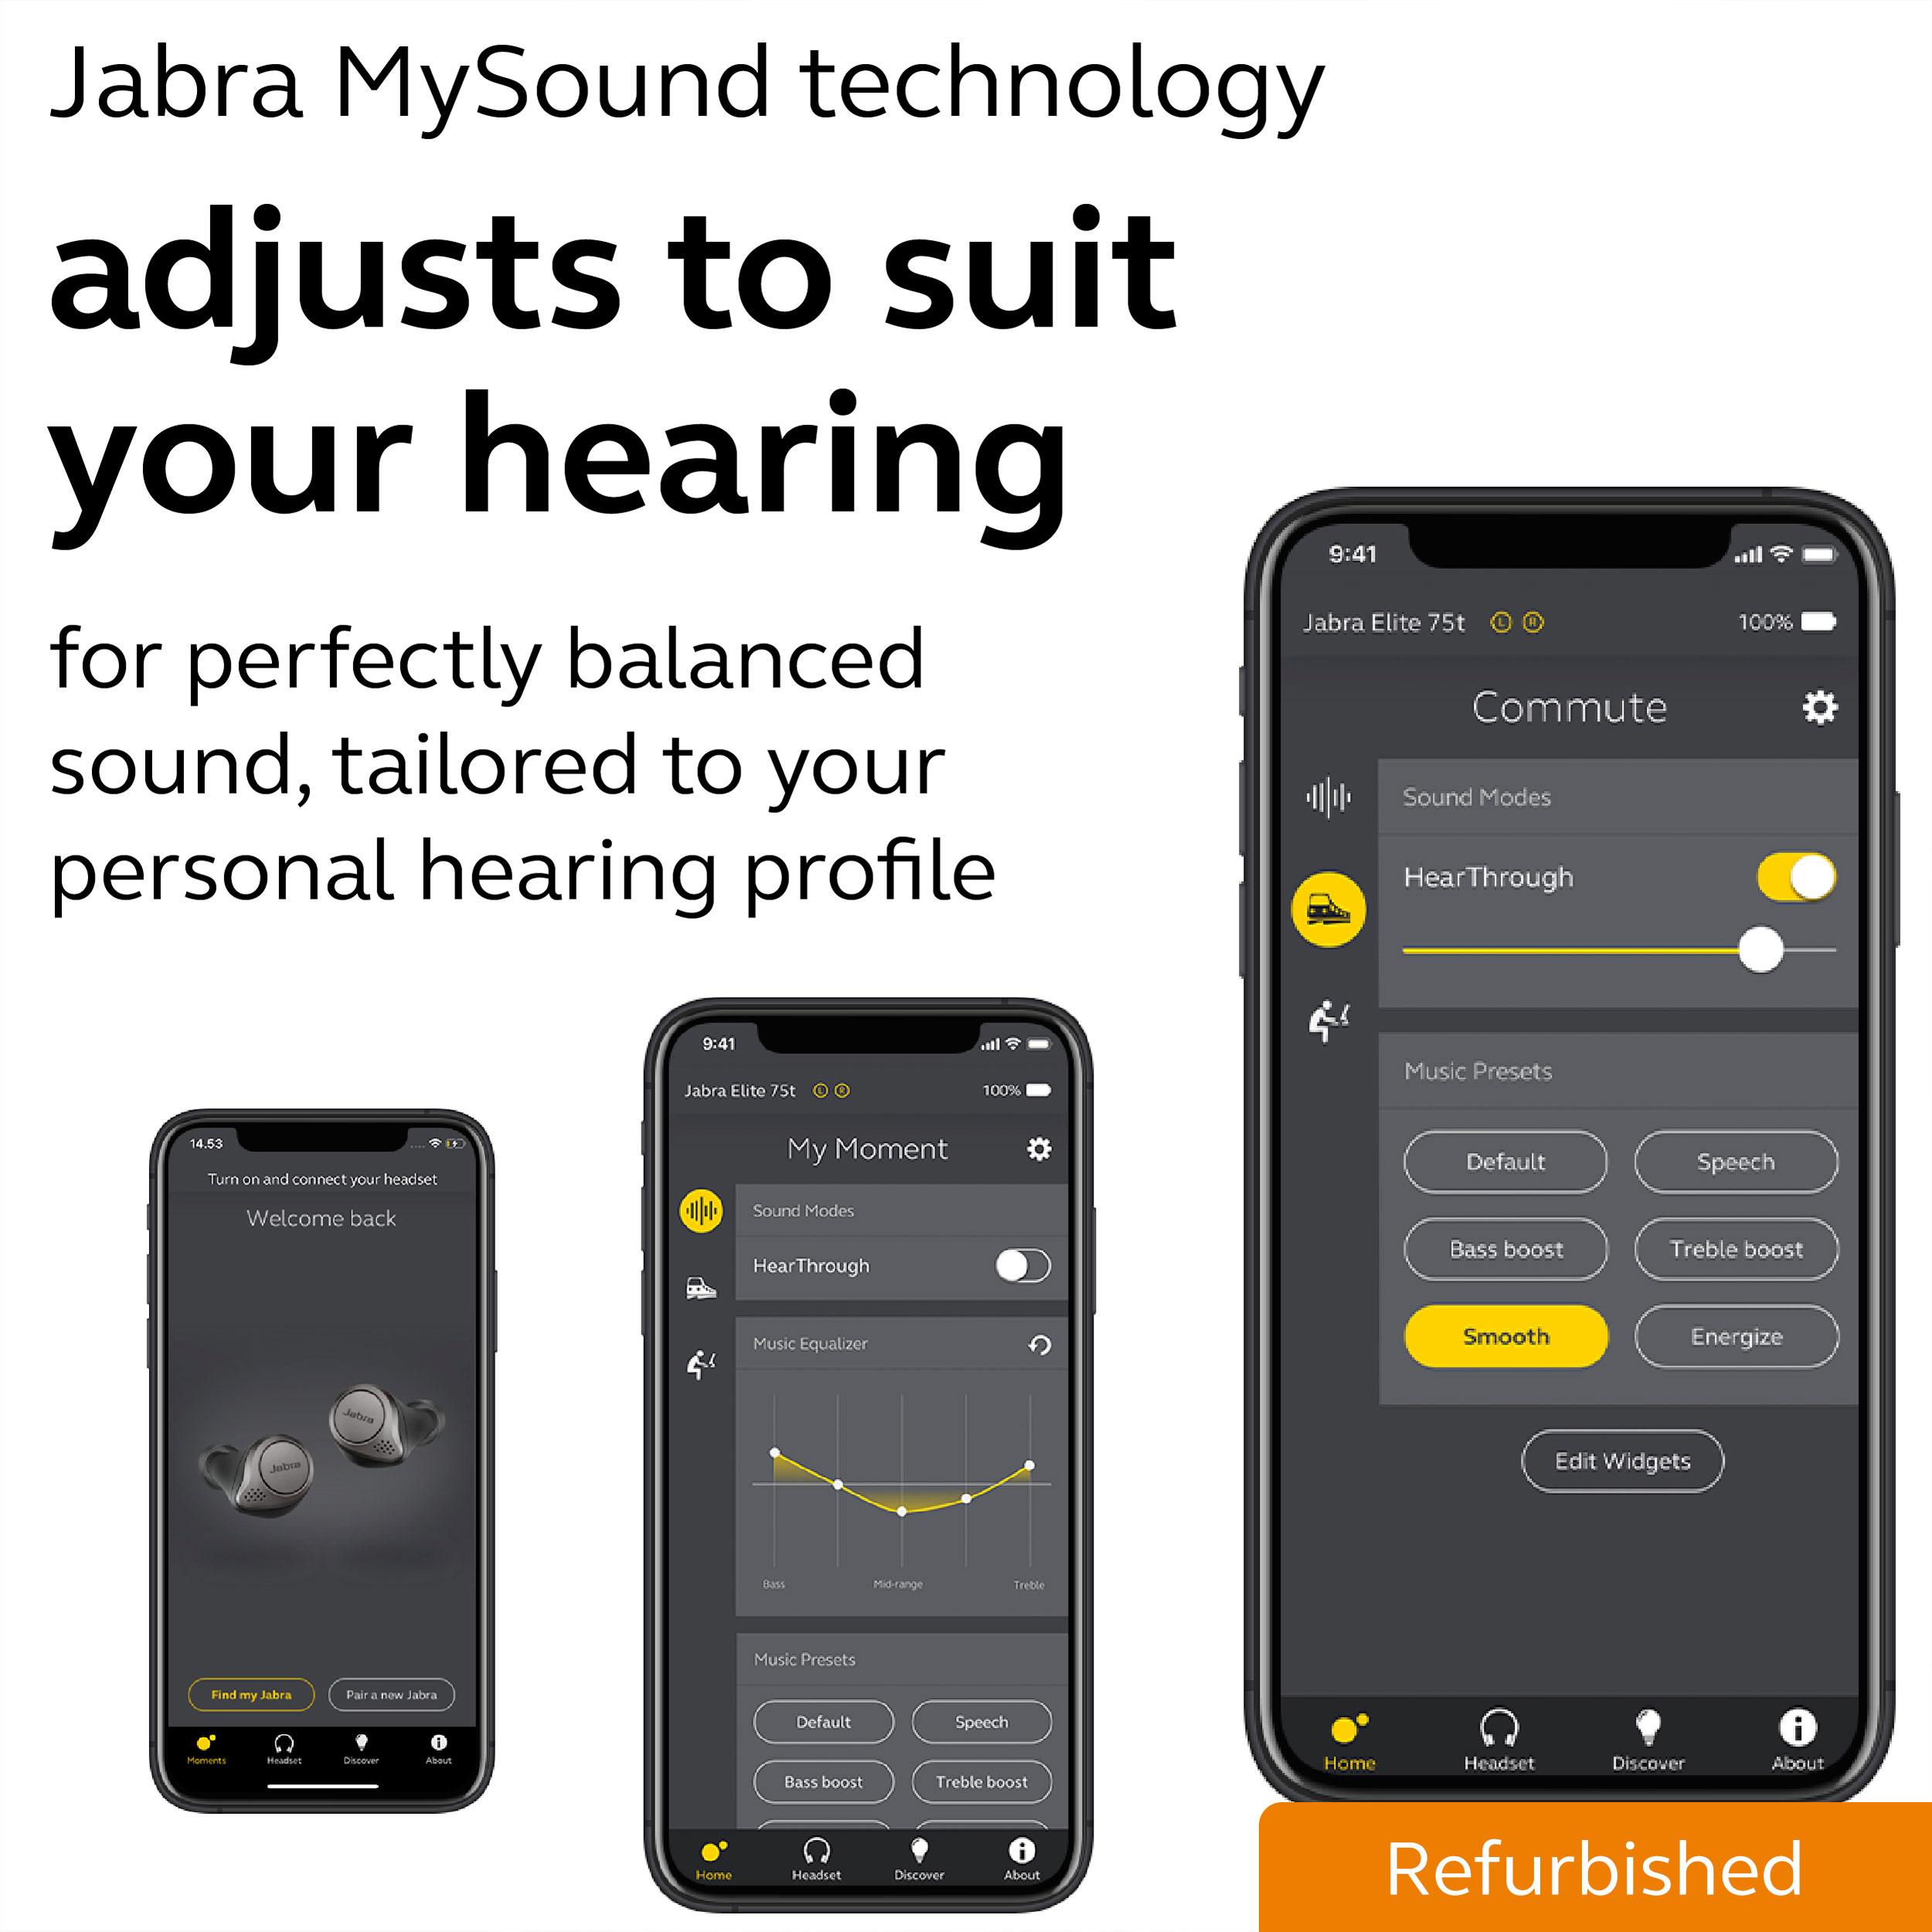 Jabra-Elite-75t-Voice-Assistant-True-Wireless-earbuds-Manufacturer-Refurbished thumbnail 15